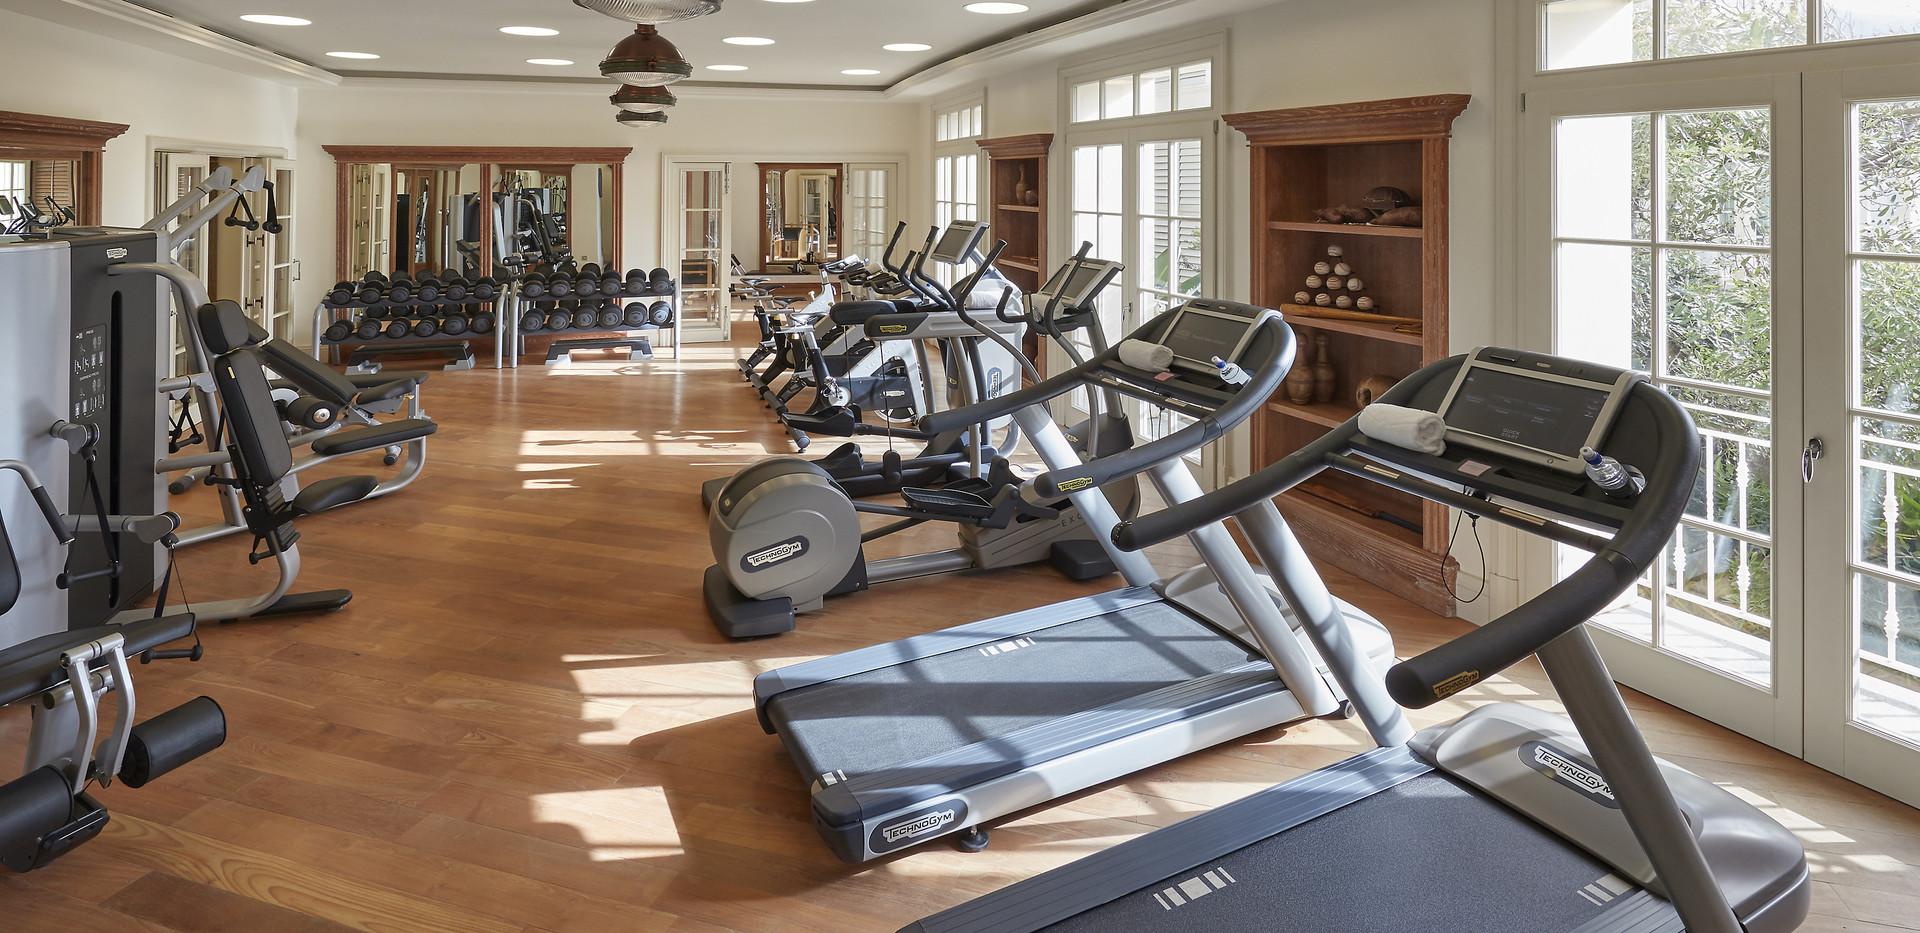 canouan-luxury-spa-fitness-centre.jpg